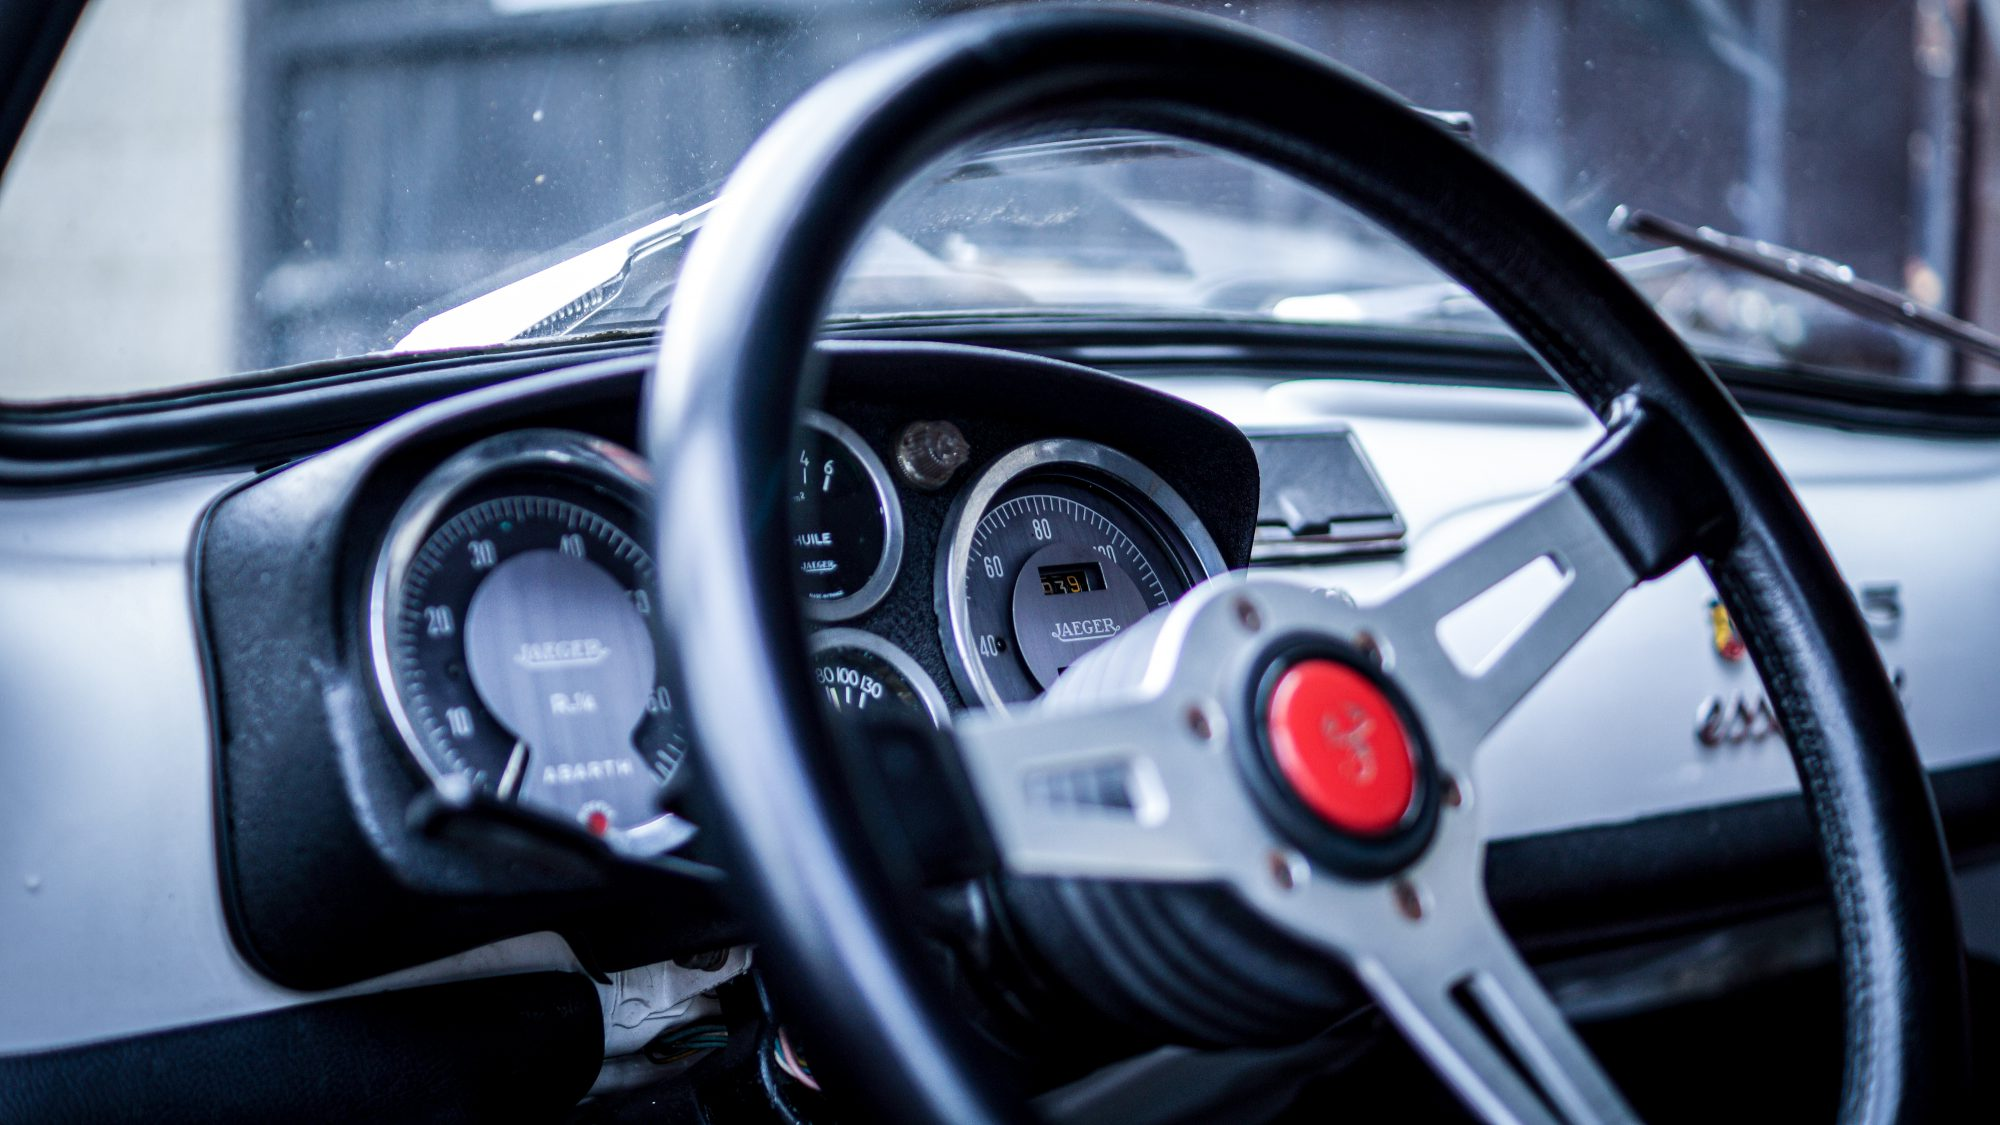 Abarth, Abarth 595, 595, 500, Fiat, Fiat 500,. hot hatch, classic car, retro car, motoring, automotive, carandclassic, carandclassic.co.uk, classic Fiat, Classic Abarth,